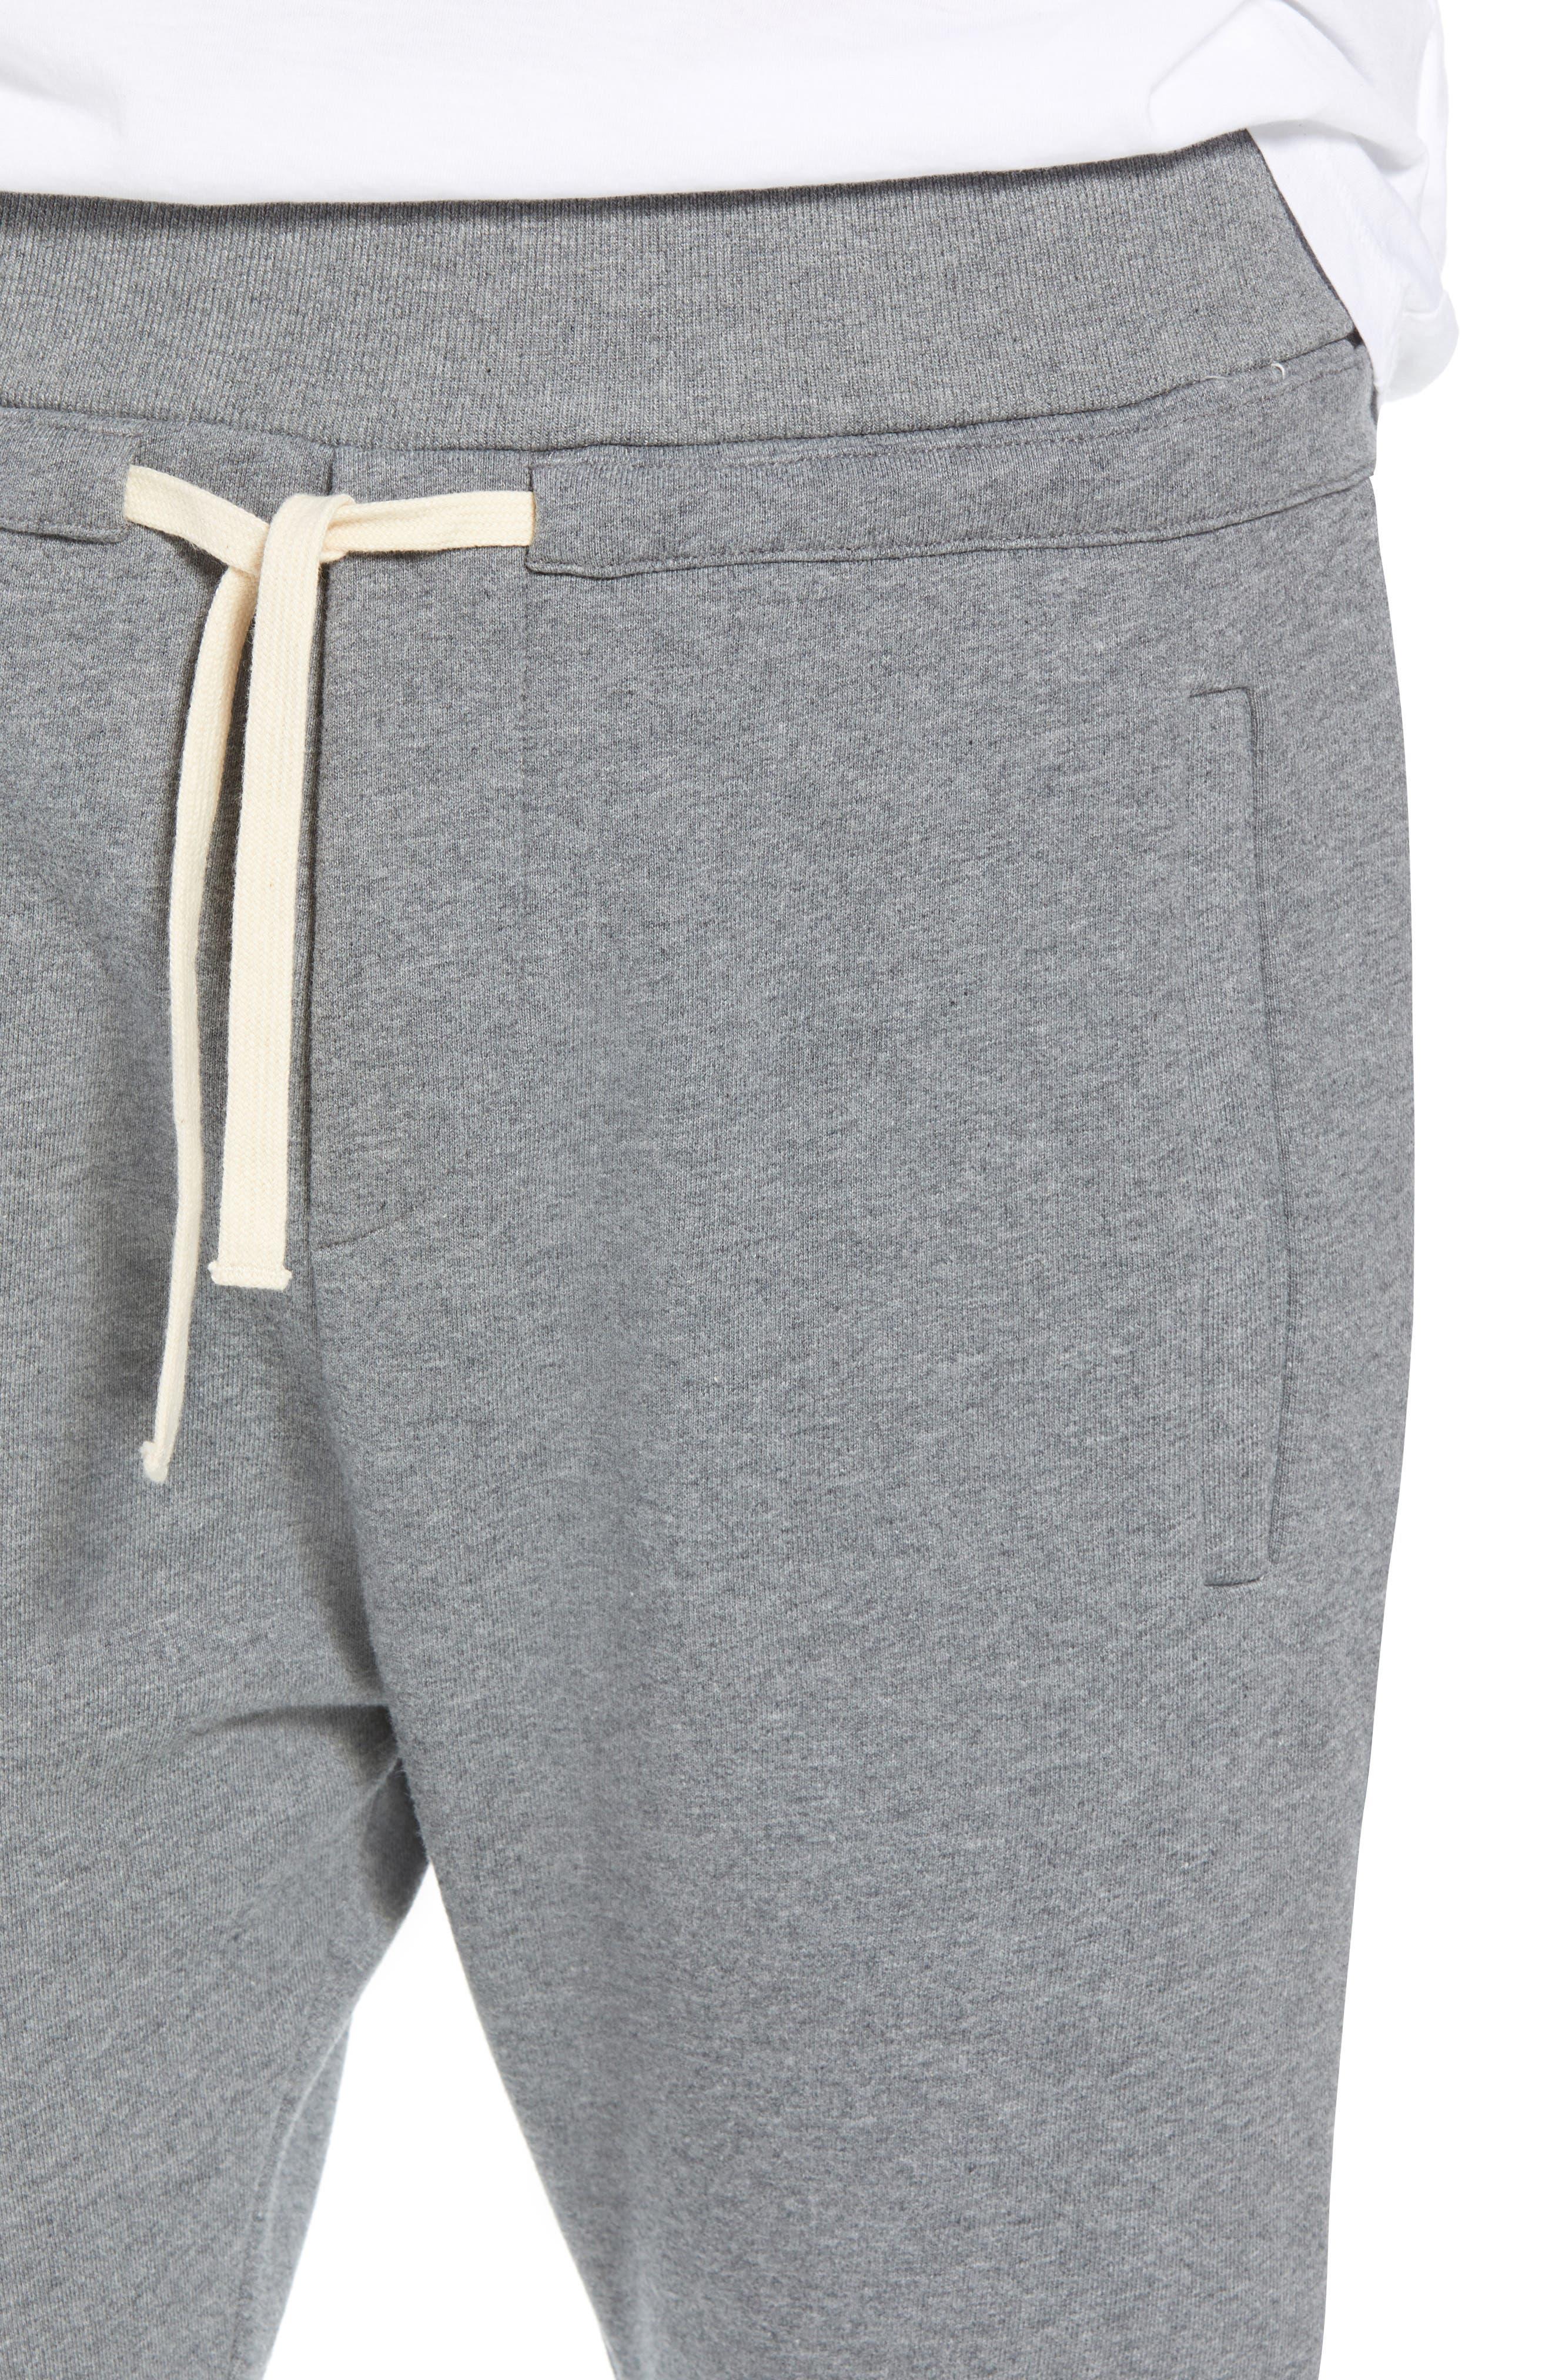 Slim Fit Jogger Pants,                             Alternate thumbnail 4, color,                             GREY